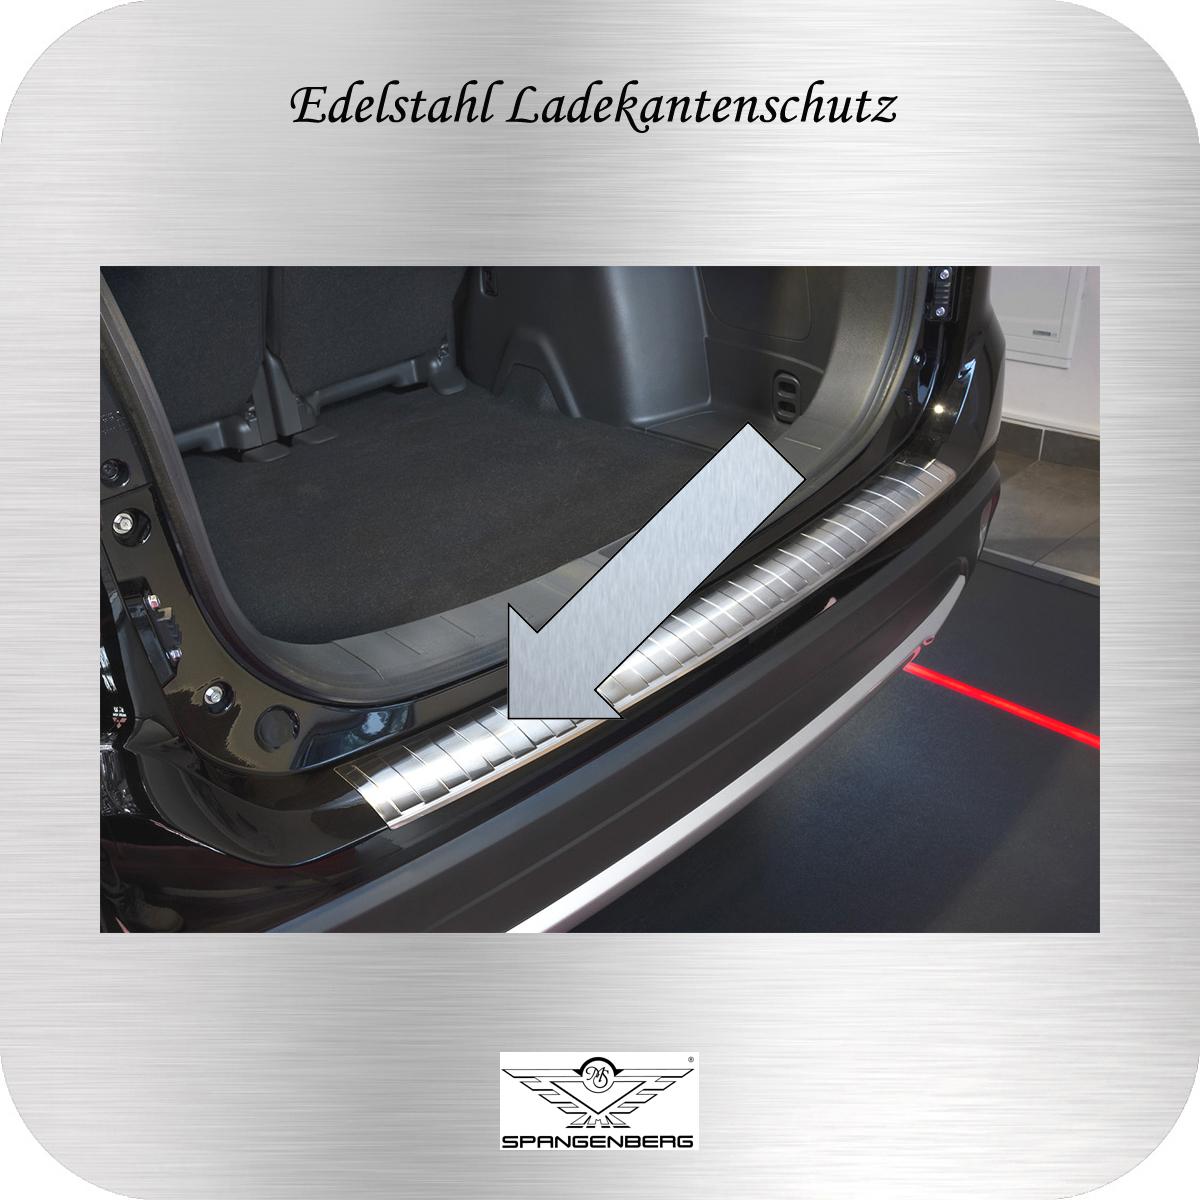 Ladekantenschutz Edelstahl Mitsubishi Outlander III ab FL 2015- 3235796